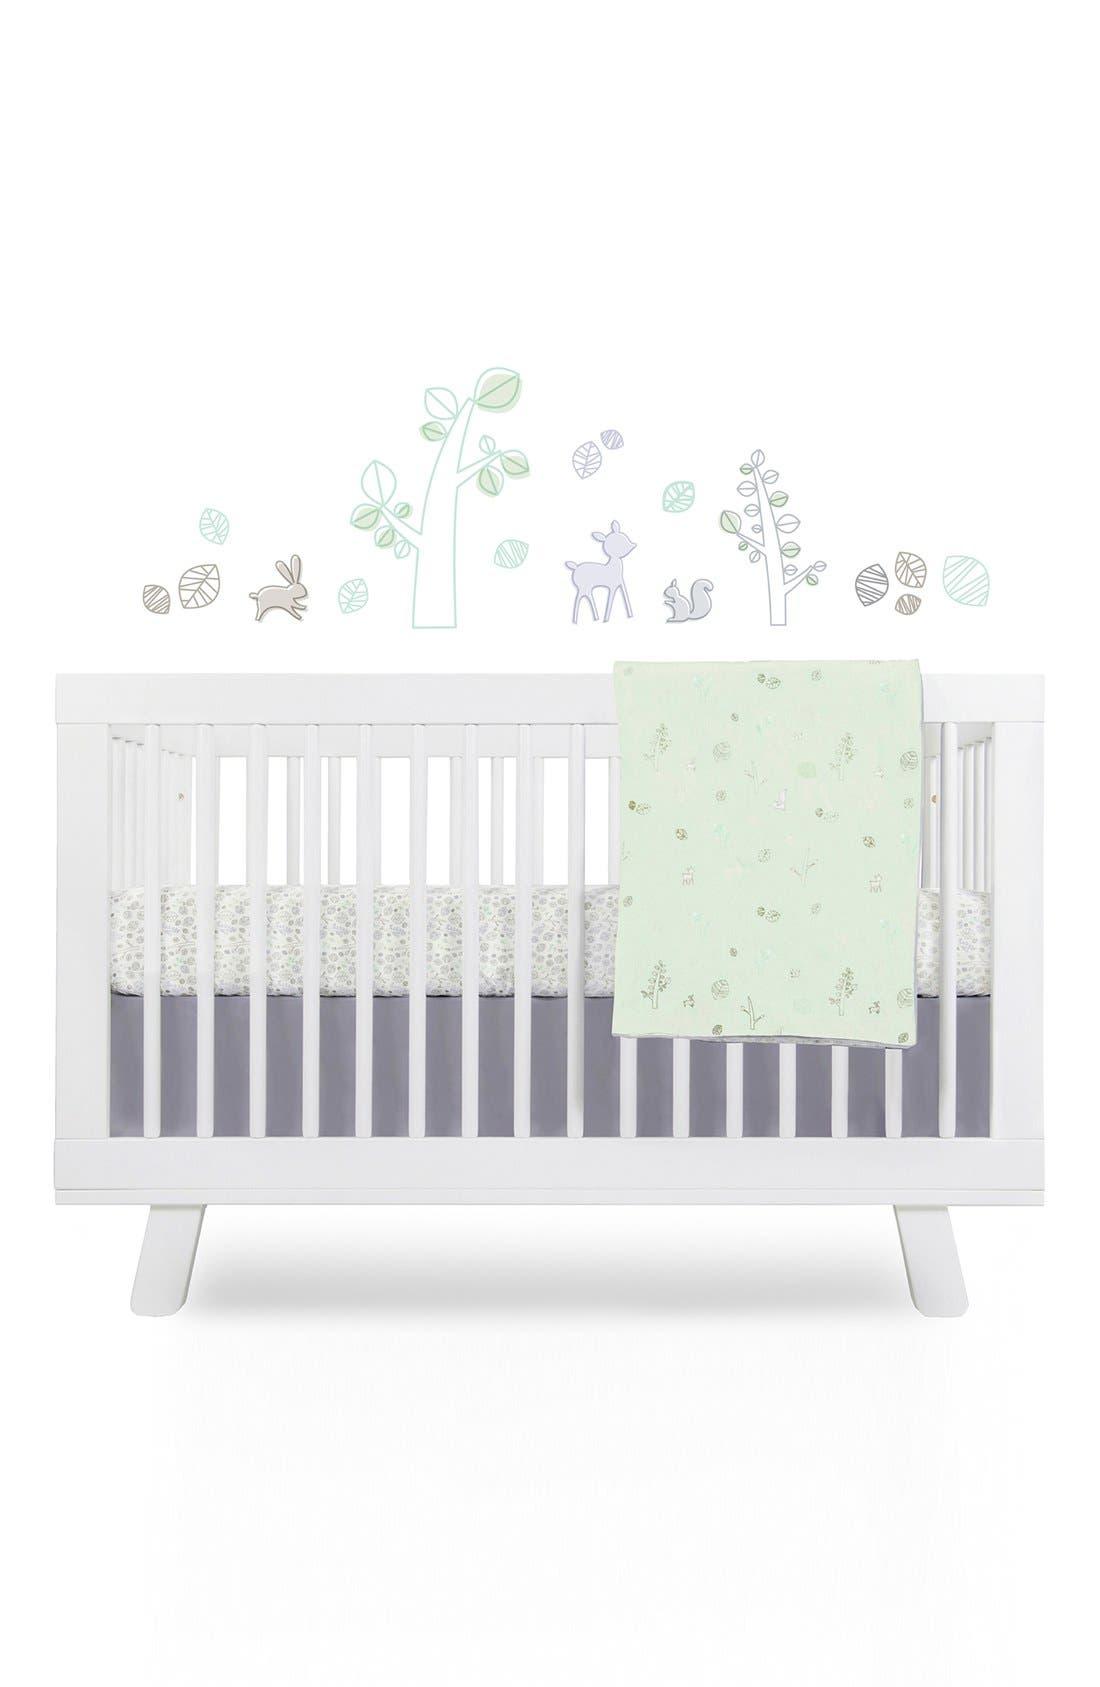 'Woods' Crib Sheet, Crib Skirt, Contour Changing Pad, Play Blanket & Wall Decals,                             Main thumbnail 1, color,                             300